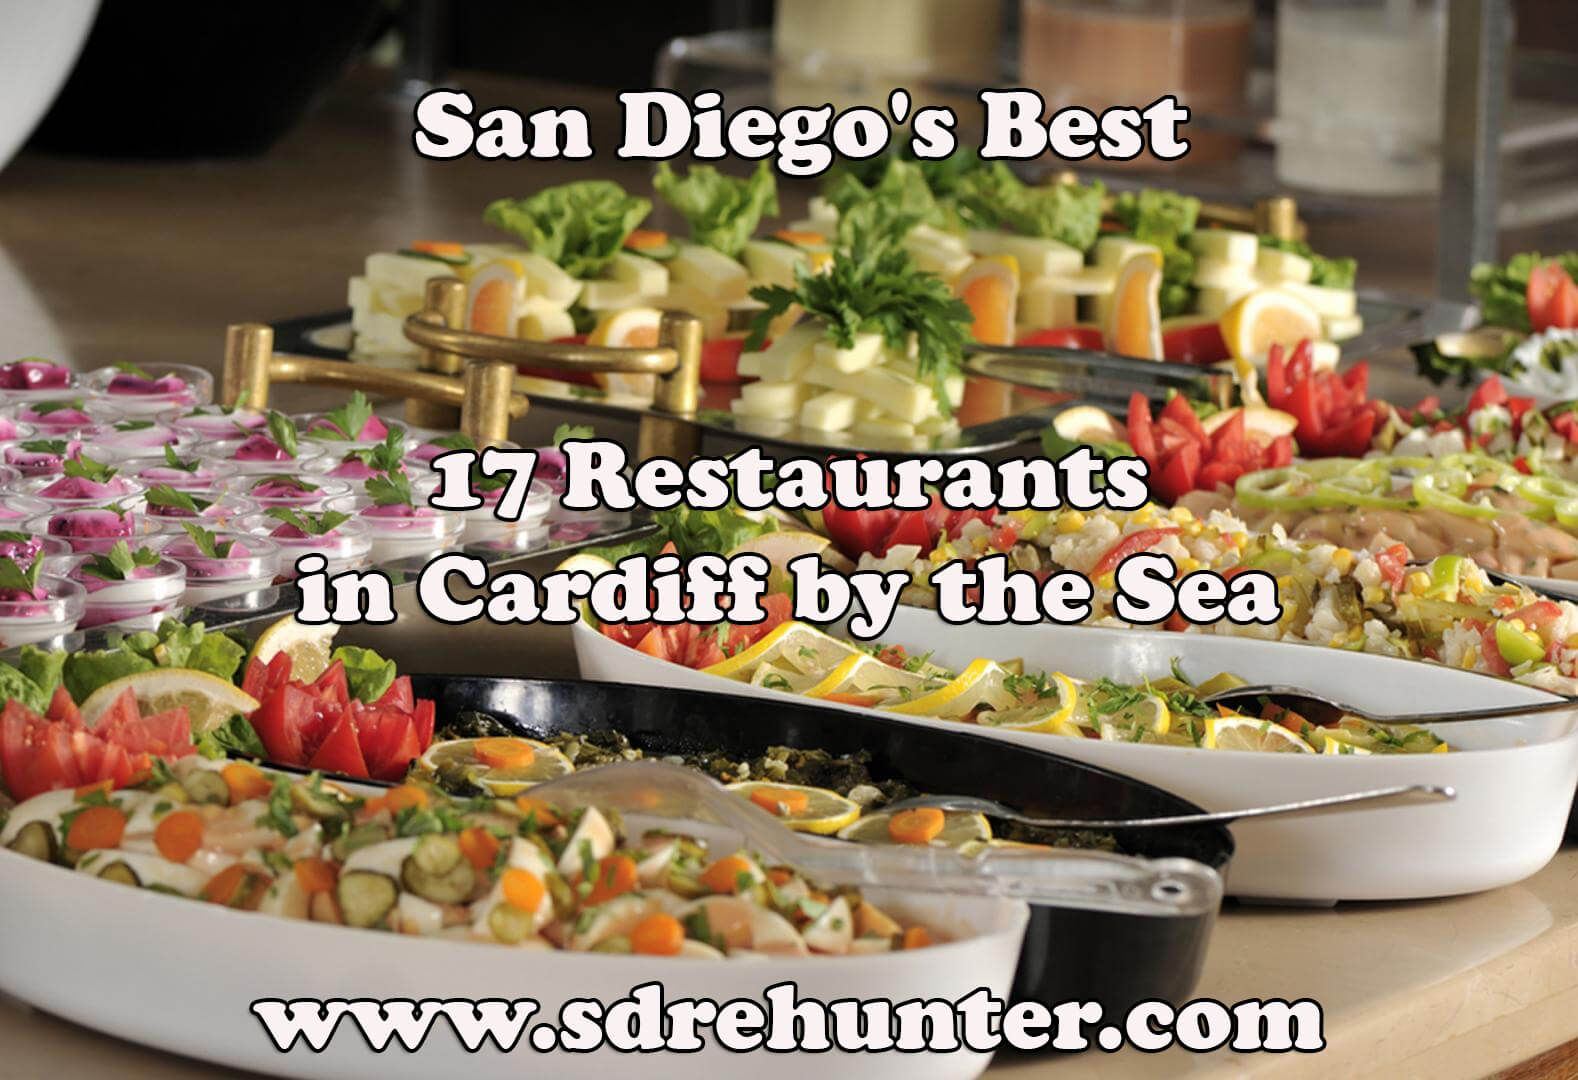 Best Food Dehydrator 2020 Cardiff San Diego's Best 17 Restaurants in 2019 | San Diego Real